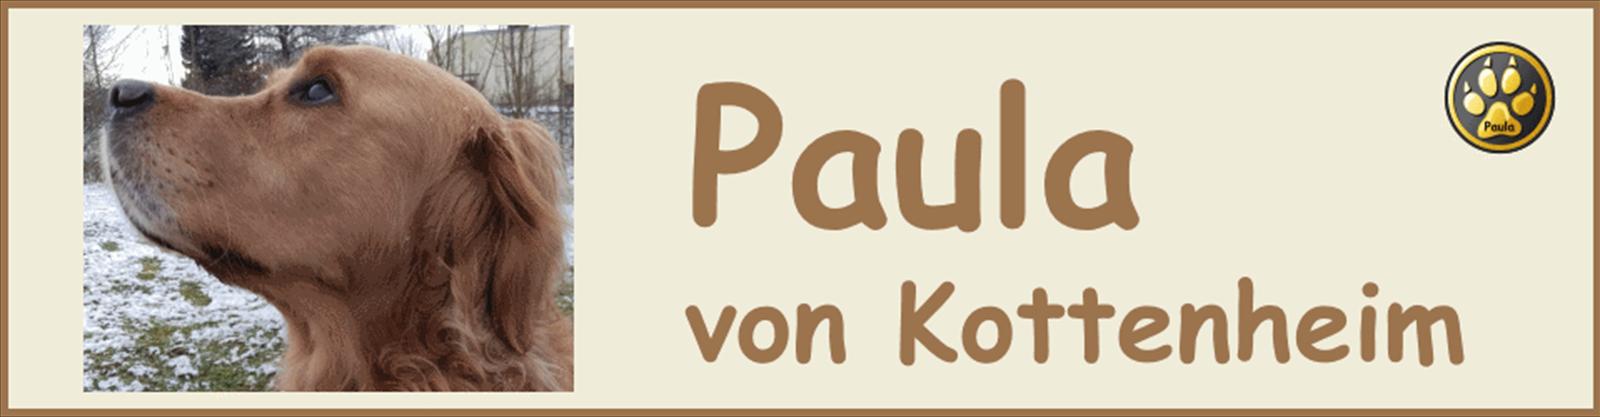 Paula-Banner-07